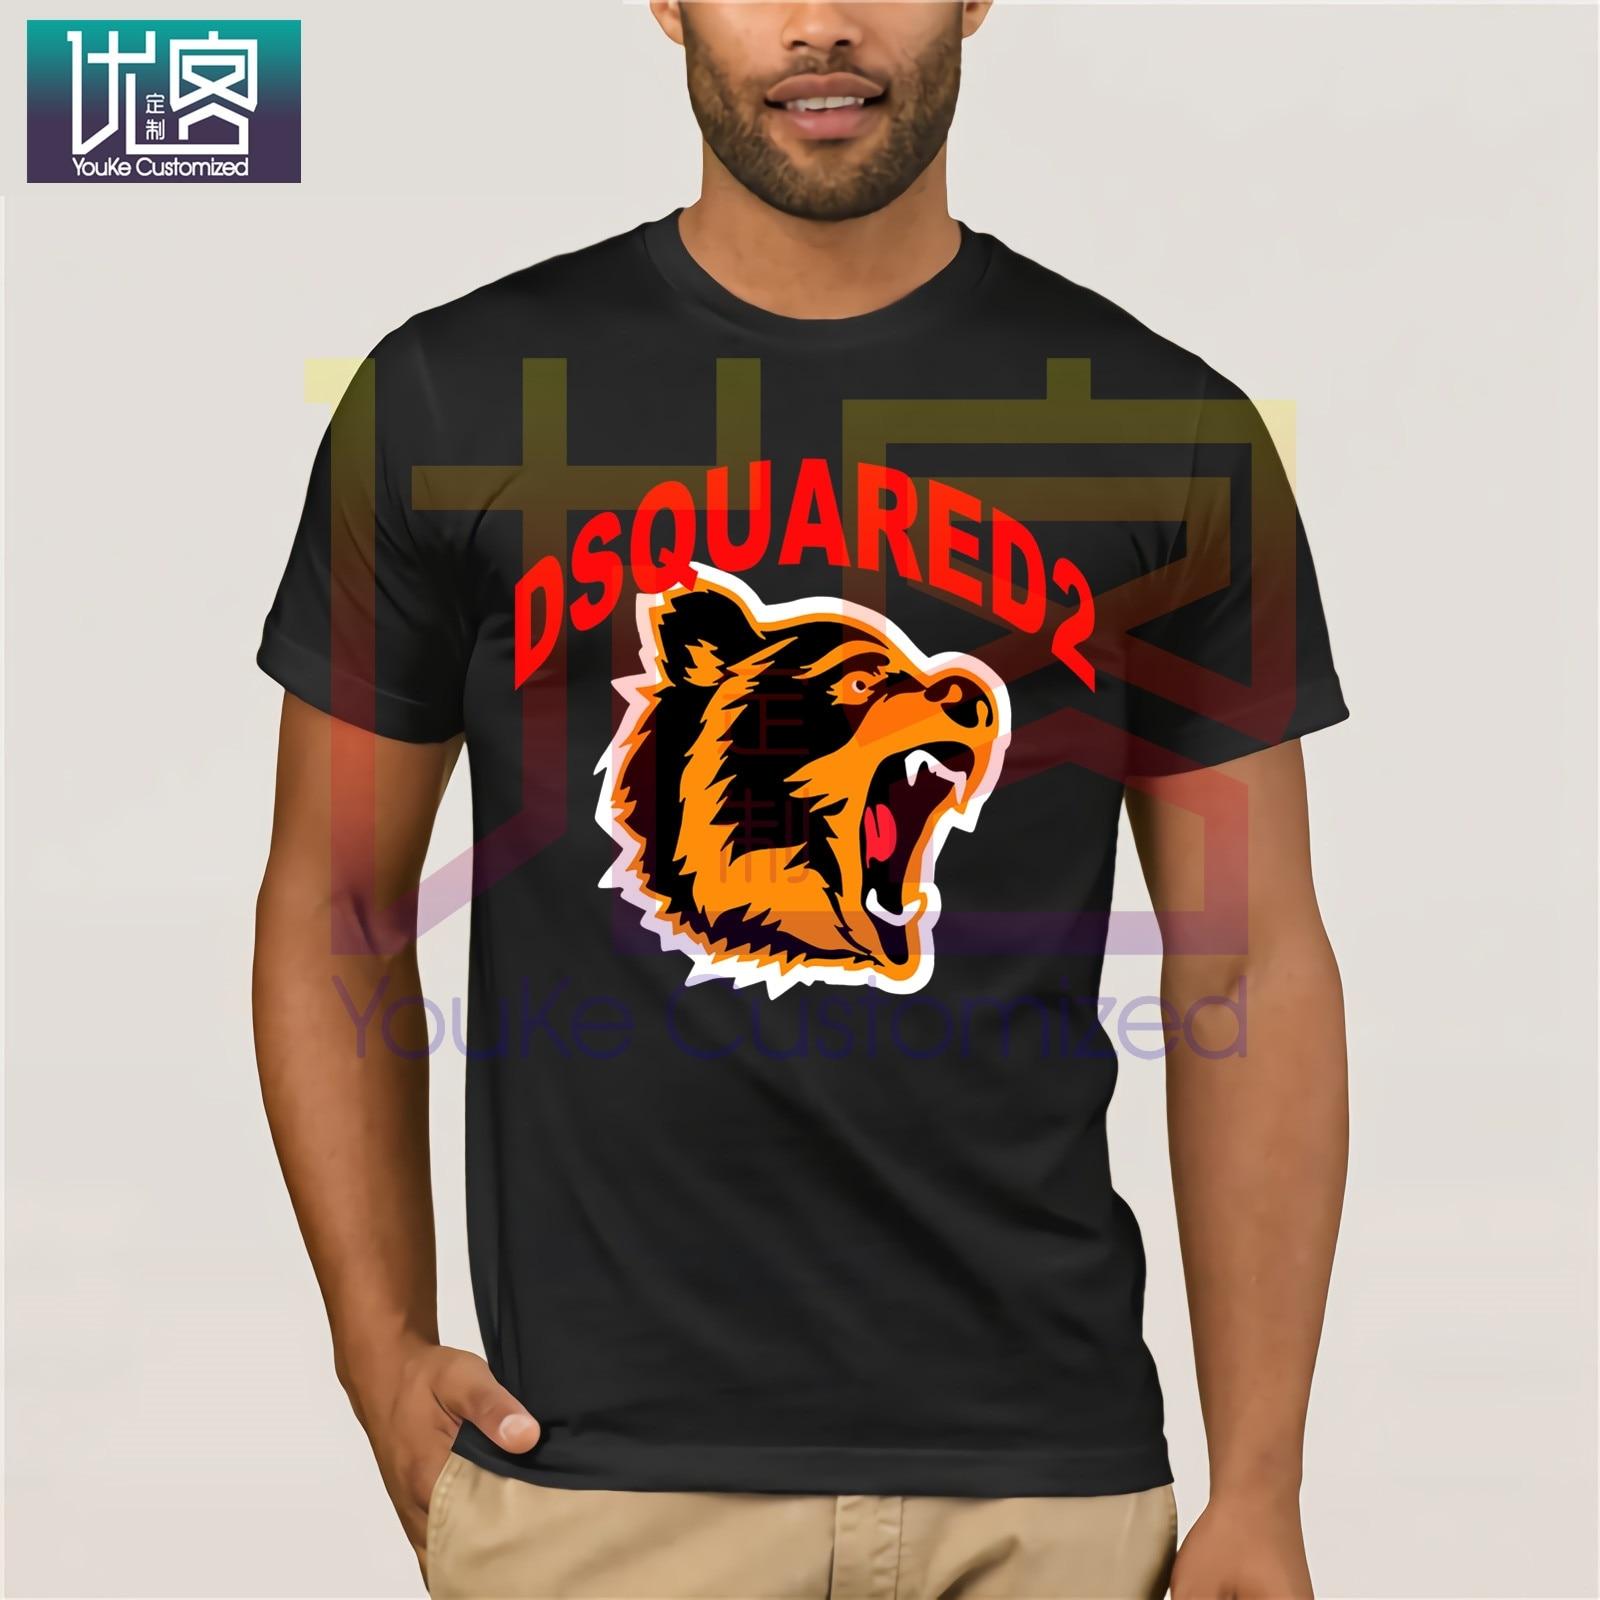 New Dsq2 Men'S T-Shirt Printed Tee Unisex Size S-3Xl Clothes Popular T-Shirt Crewneck 100% Cotton Tees Cotton Tee Shirt Present